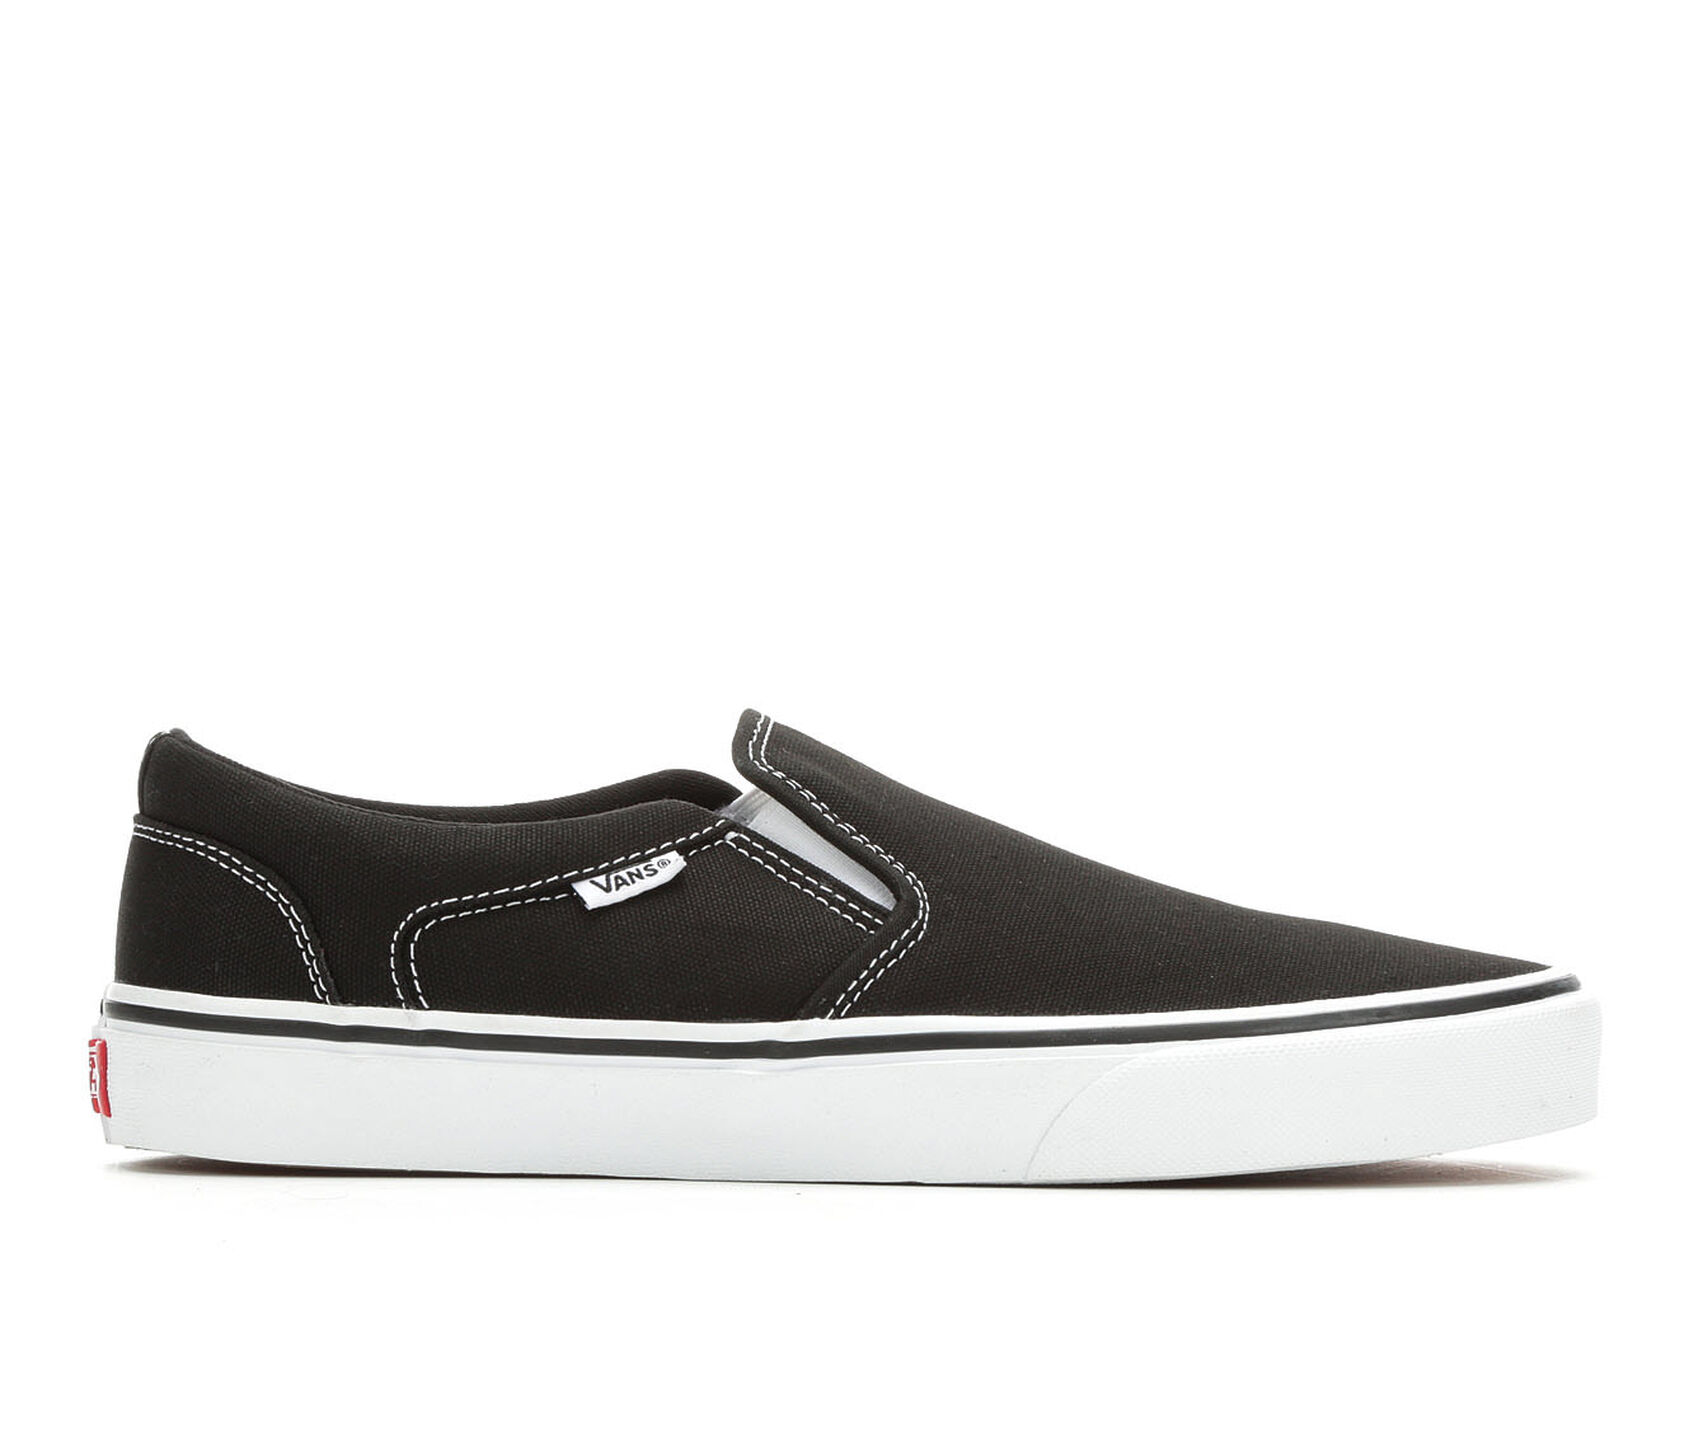 80967a3edc3ee3 Men s Vans Asher Slip-On Skate Shoes